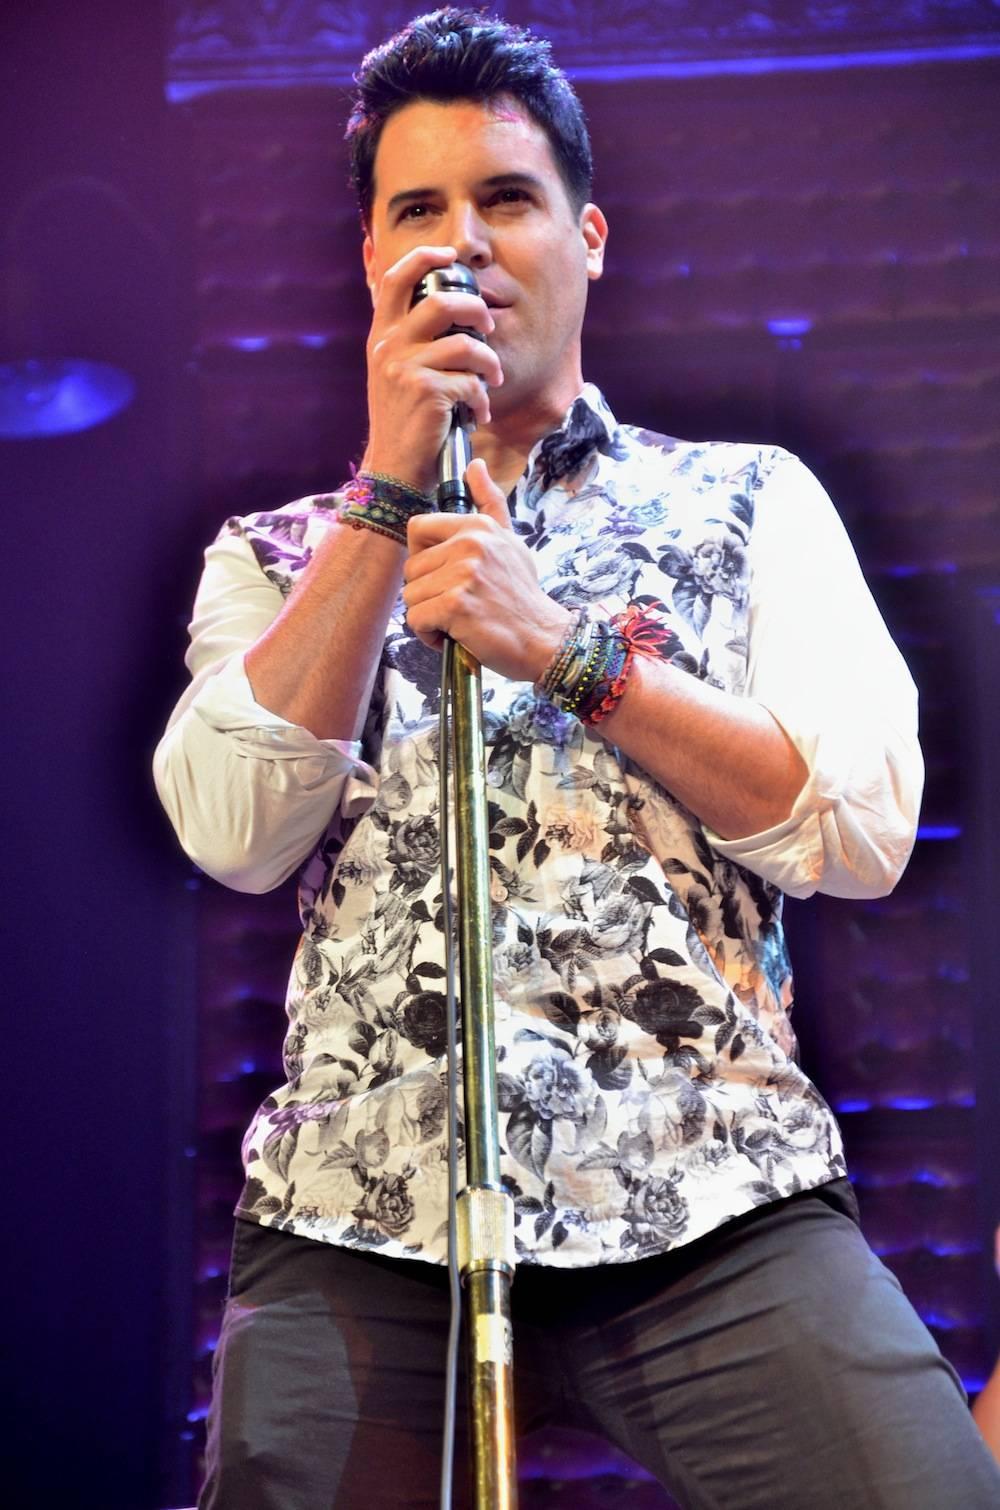 Frankie Moreno Guest Performance at MDQ LV ©Caesars Entertainment